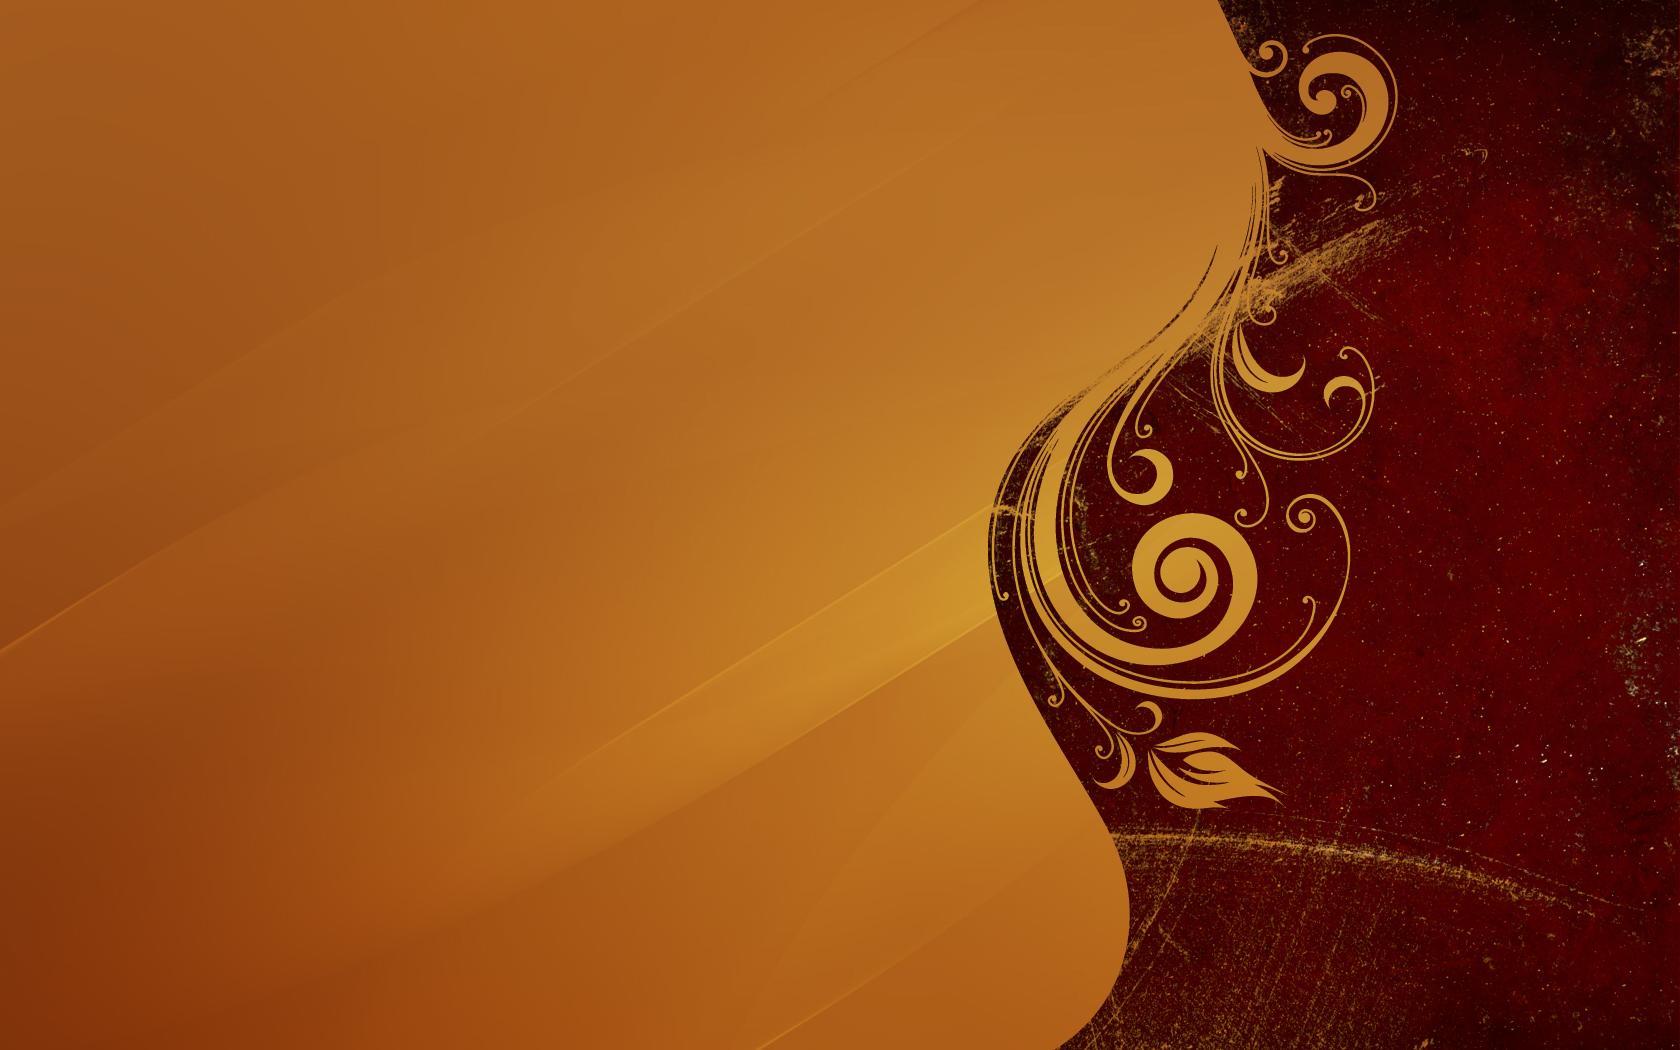 Graphic art backgrounds wallpapersafari for Cool art design ideas